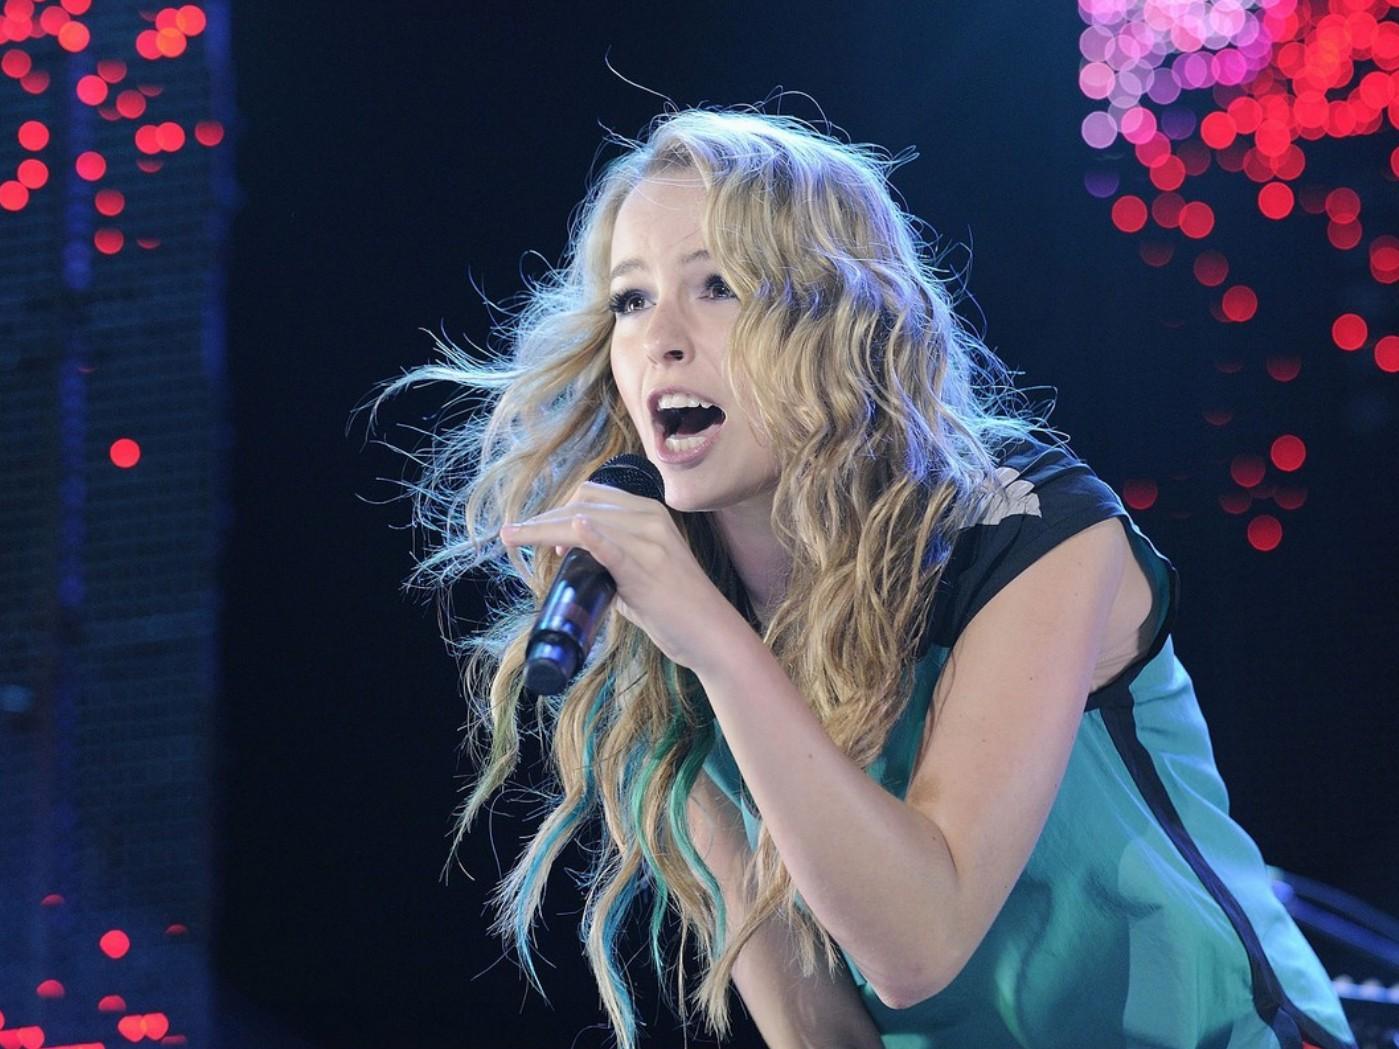 Bridgit_Mendler_Performance_Toronto_August_26_2012_ (19).jpg